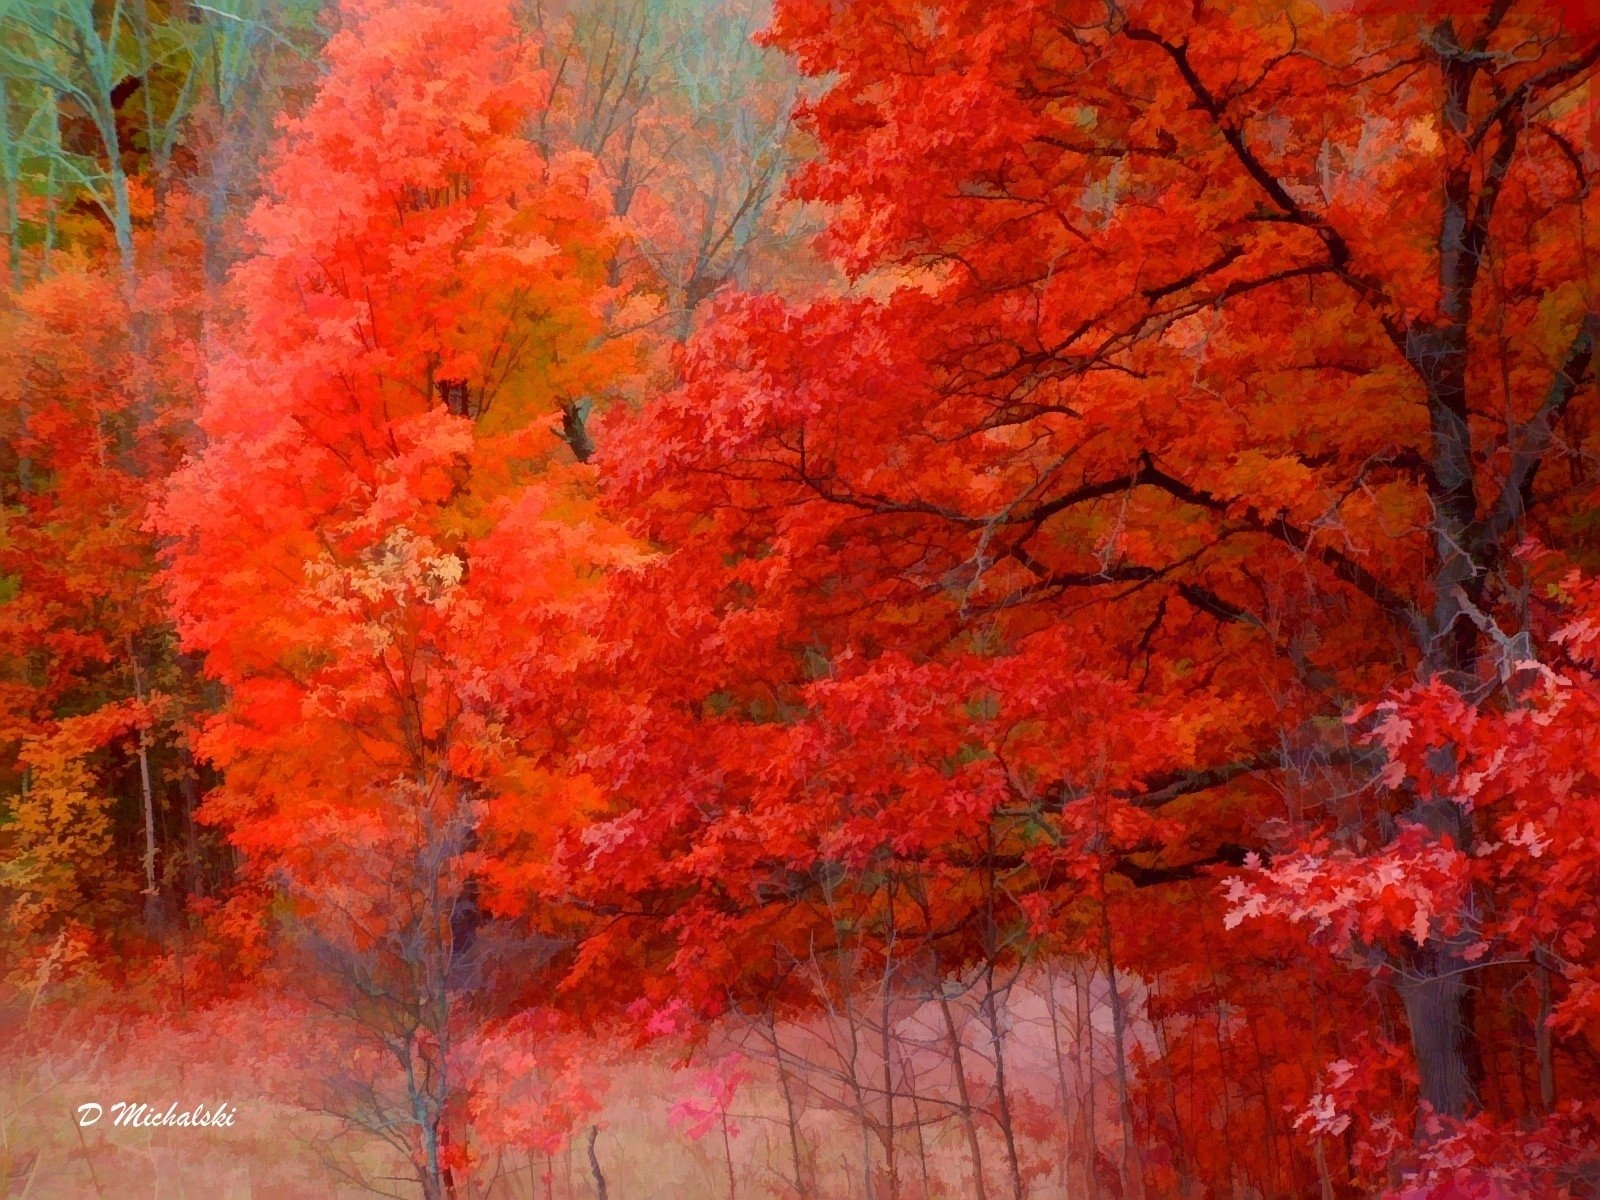 northern michigan nature art computerdestkop wallpaper 1600 798850jpg 1600x1200